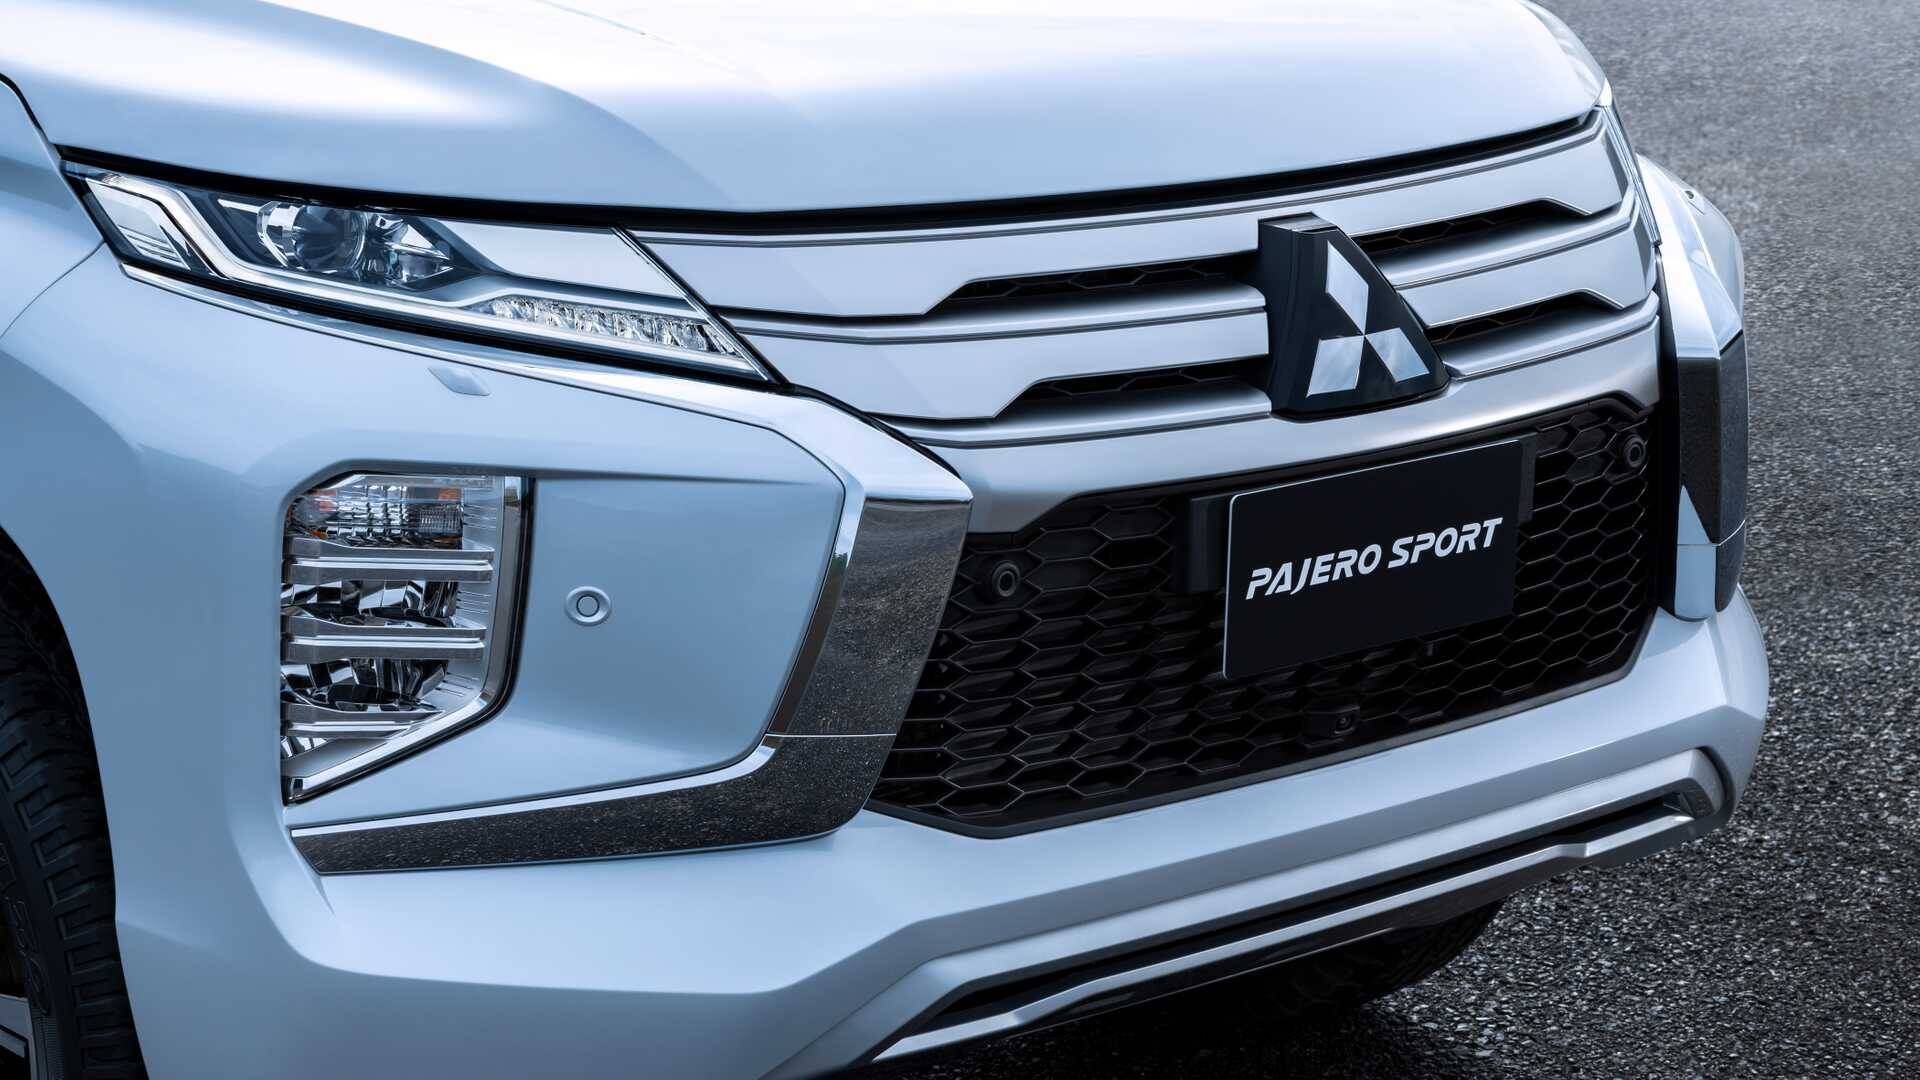 Mitsubishi Pajero Sport. Foto: Divulgação